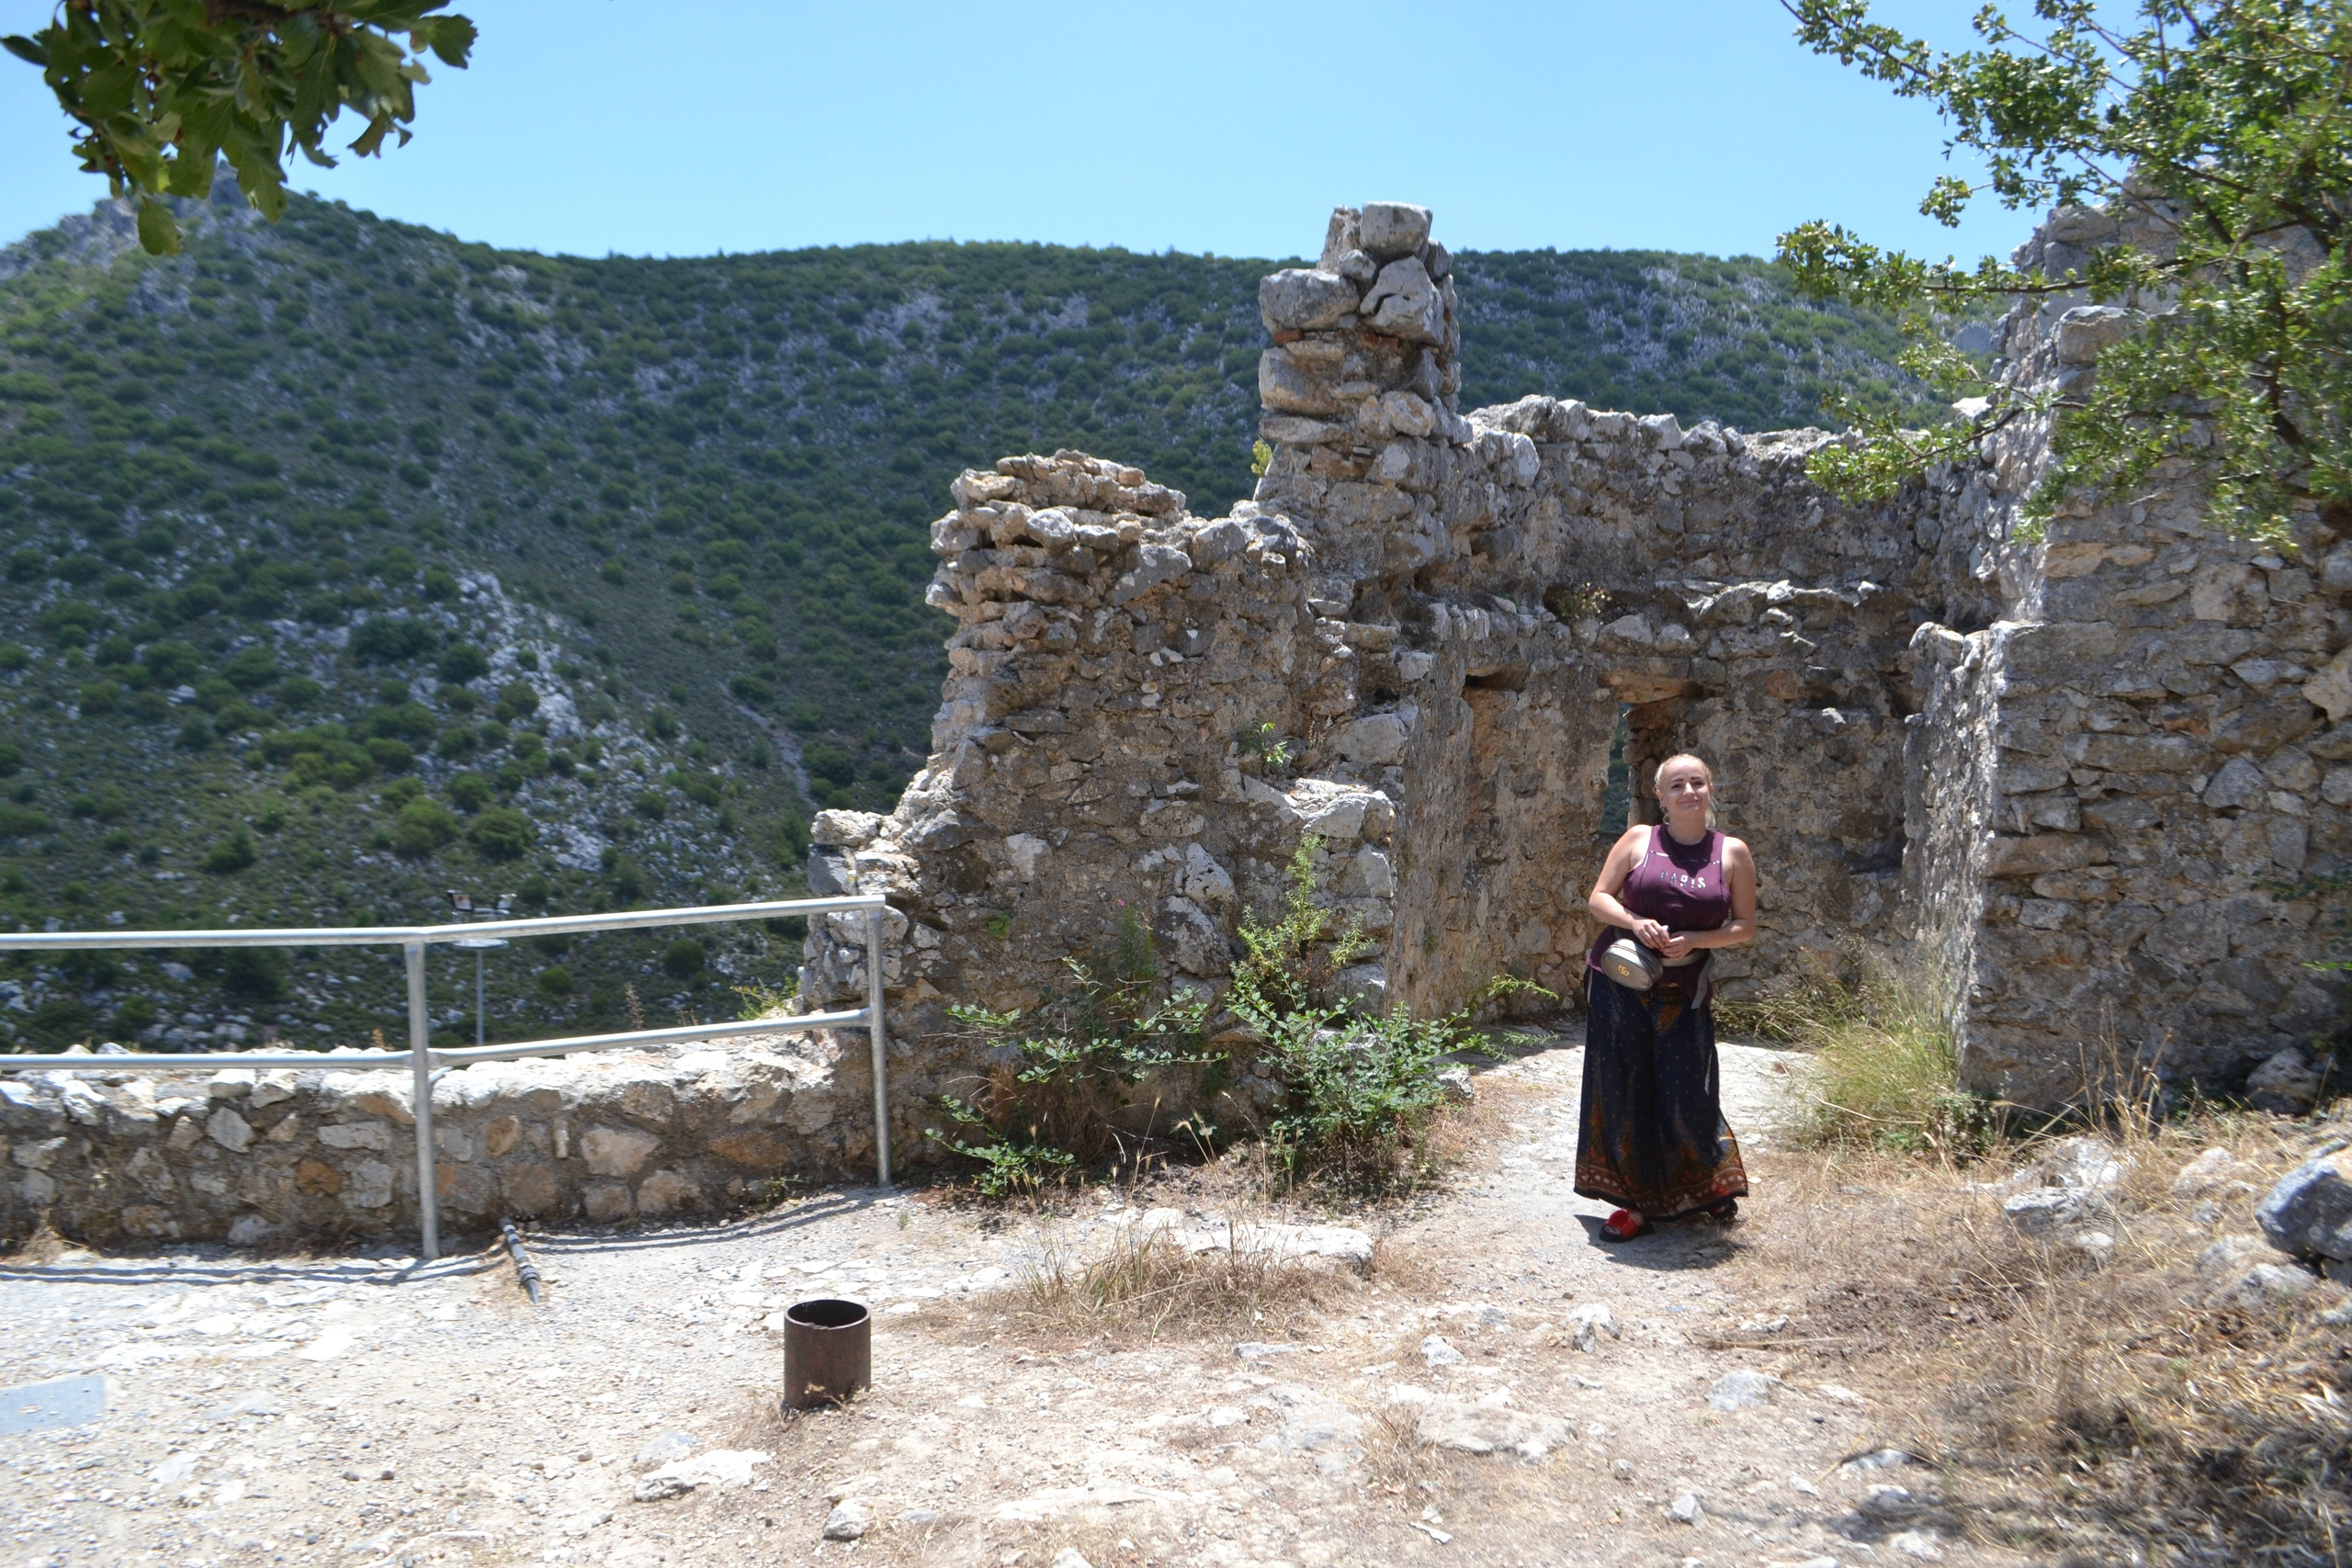 Северный Кипр. Замок Святого Иллариона. (фото). OTC0P6kSd-U